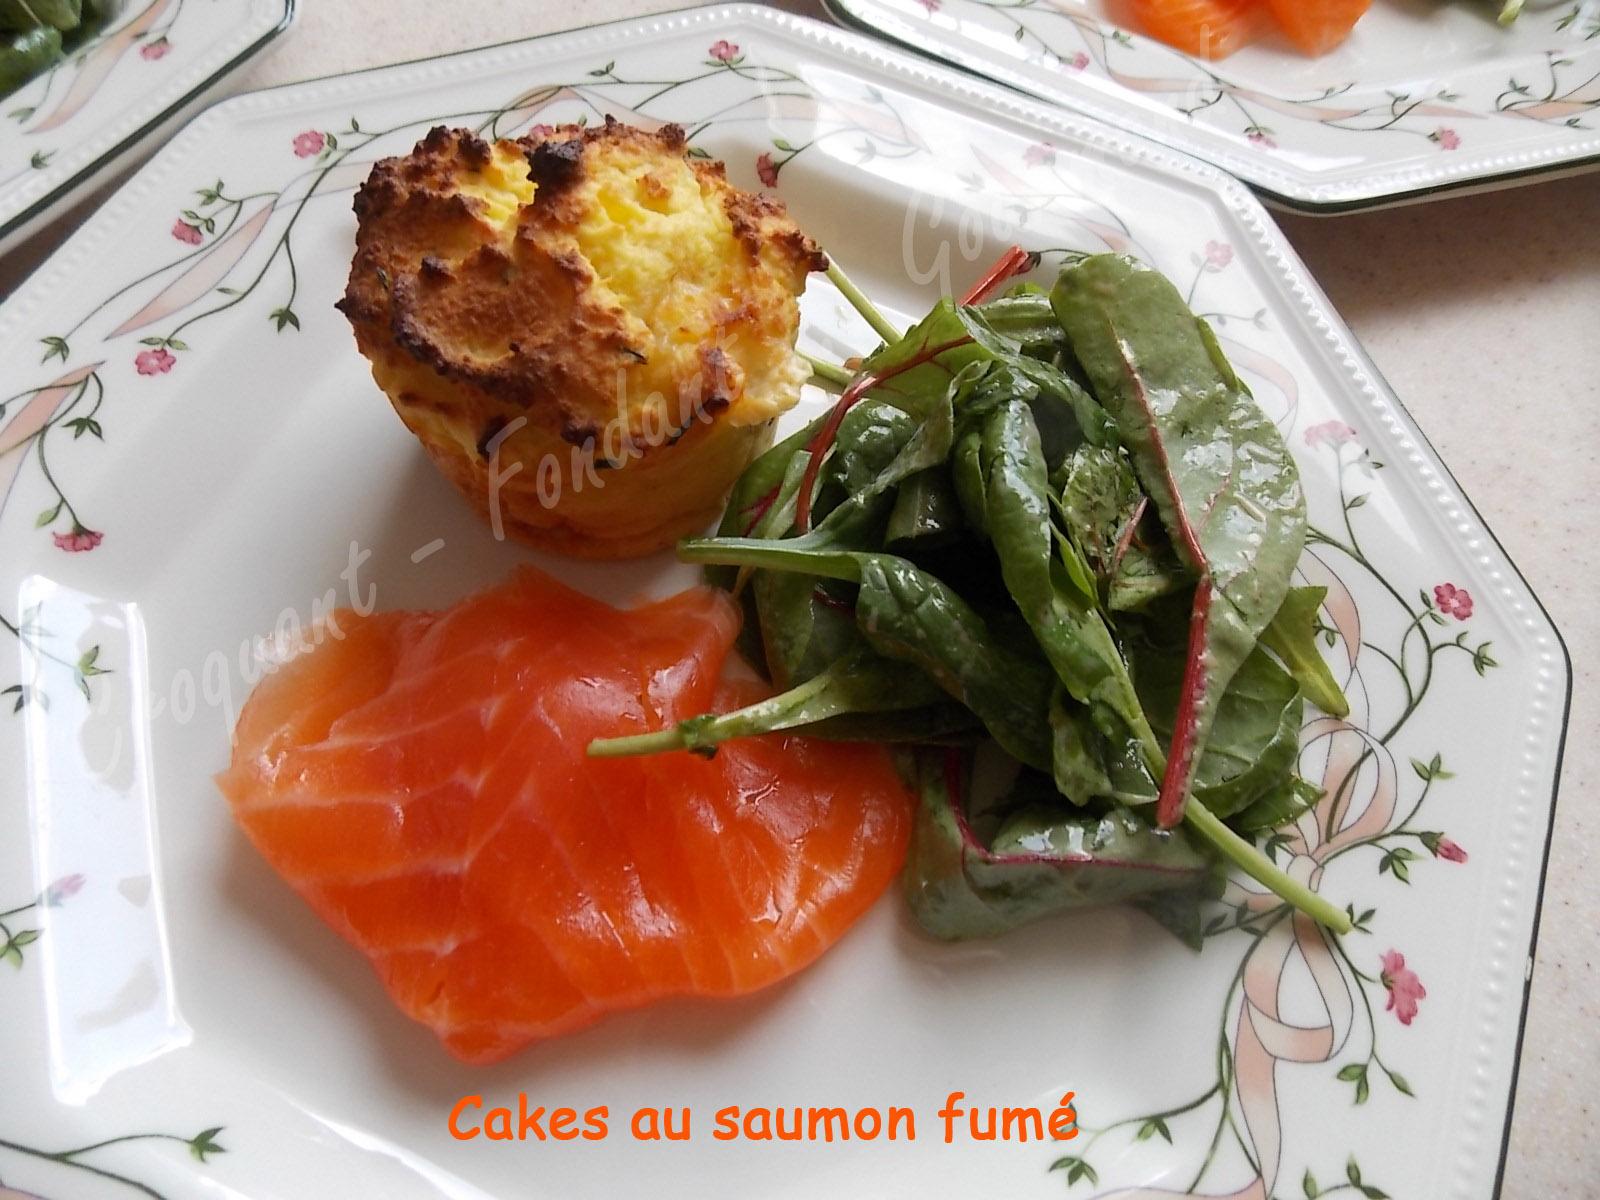 cakes au saumon fum croquant fondant gourmand. Black Bedroom Furniture Sets. Home Design Ideas